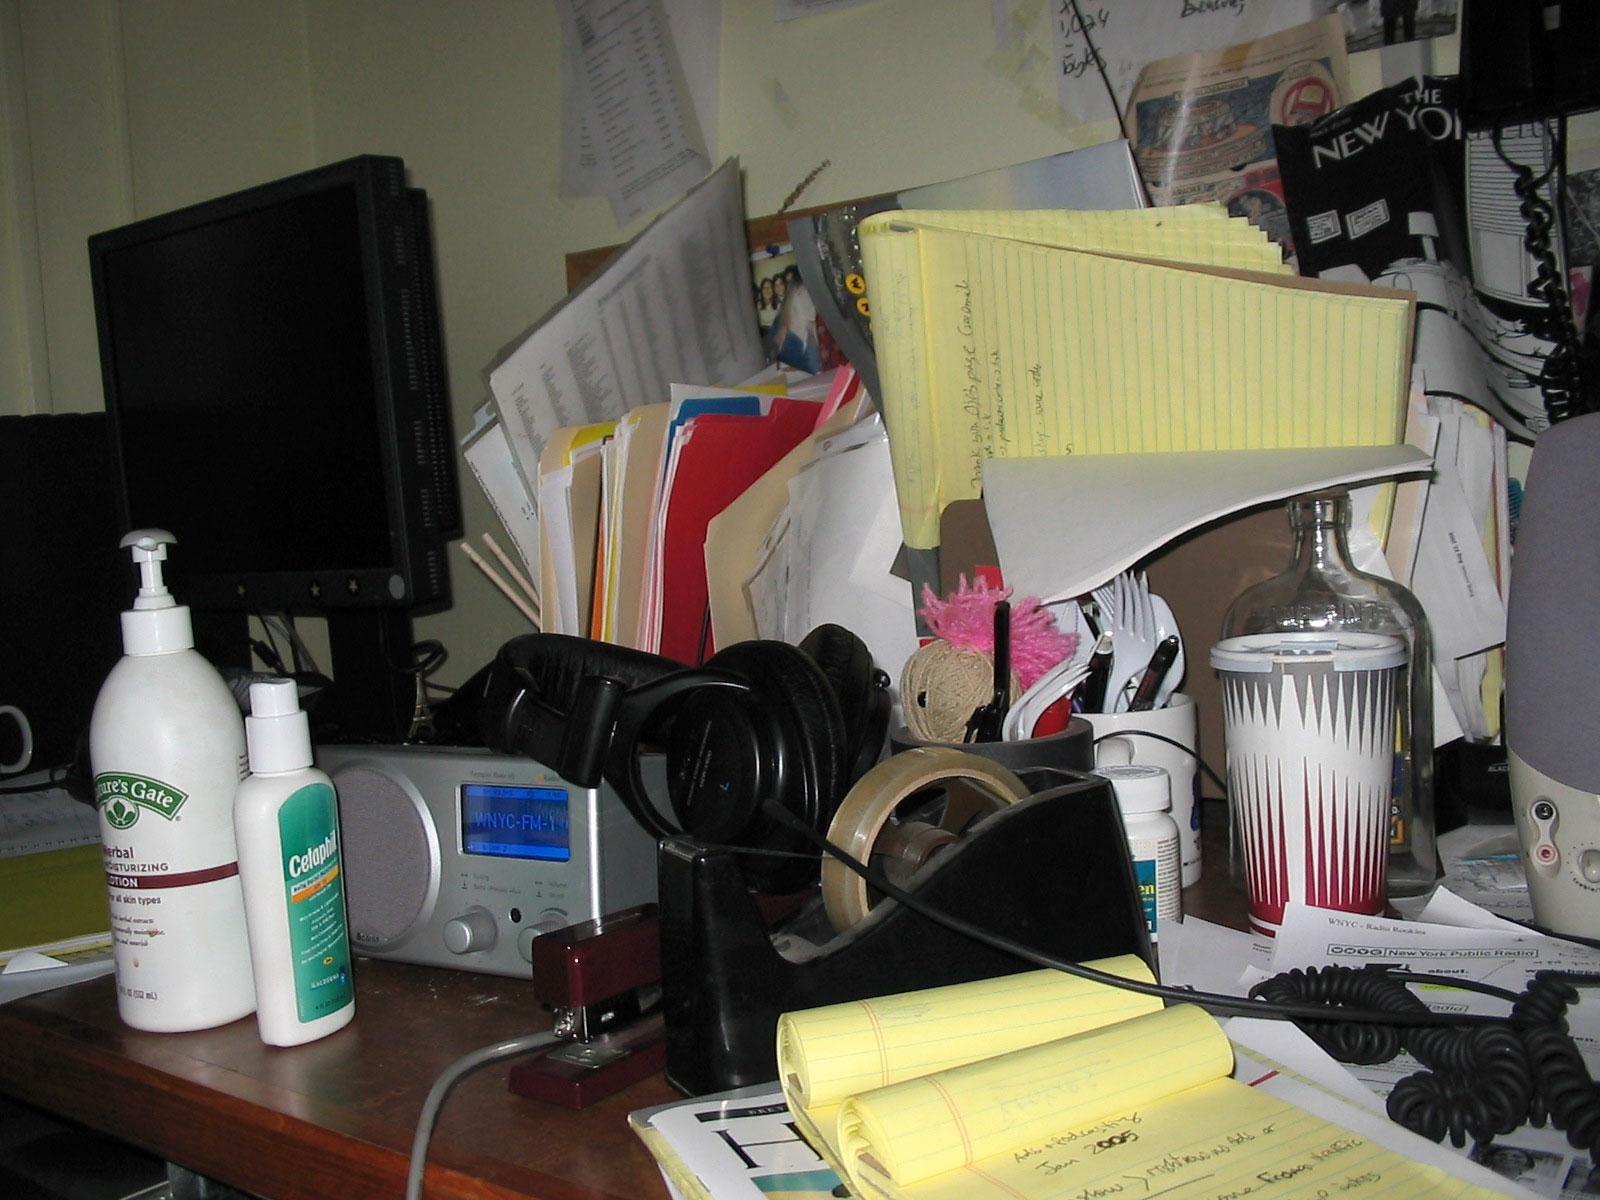 File:Messy desk.jpg - Wikimedia Commons